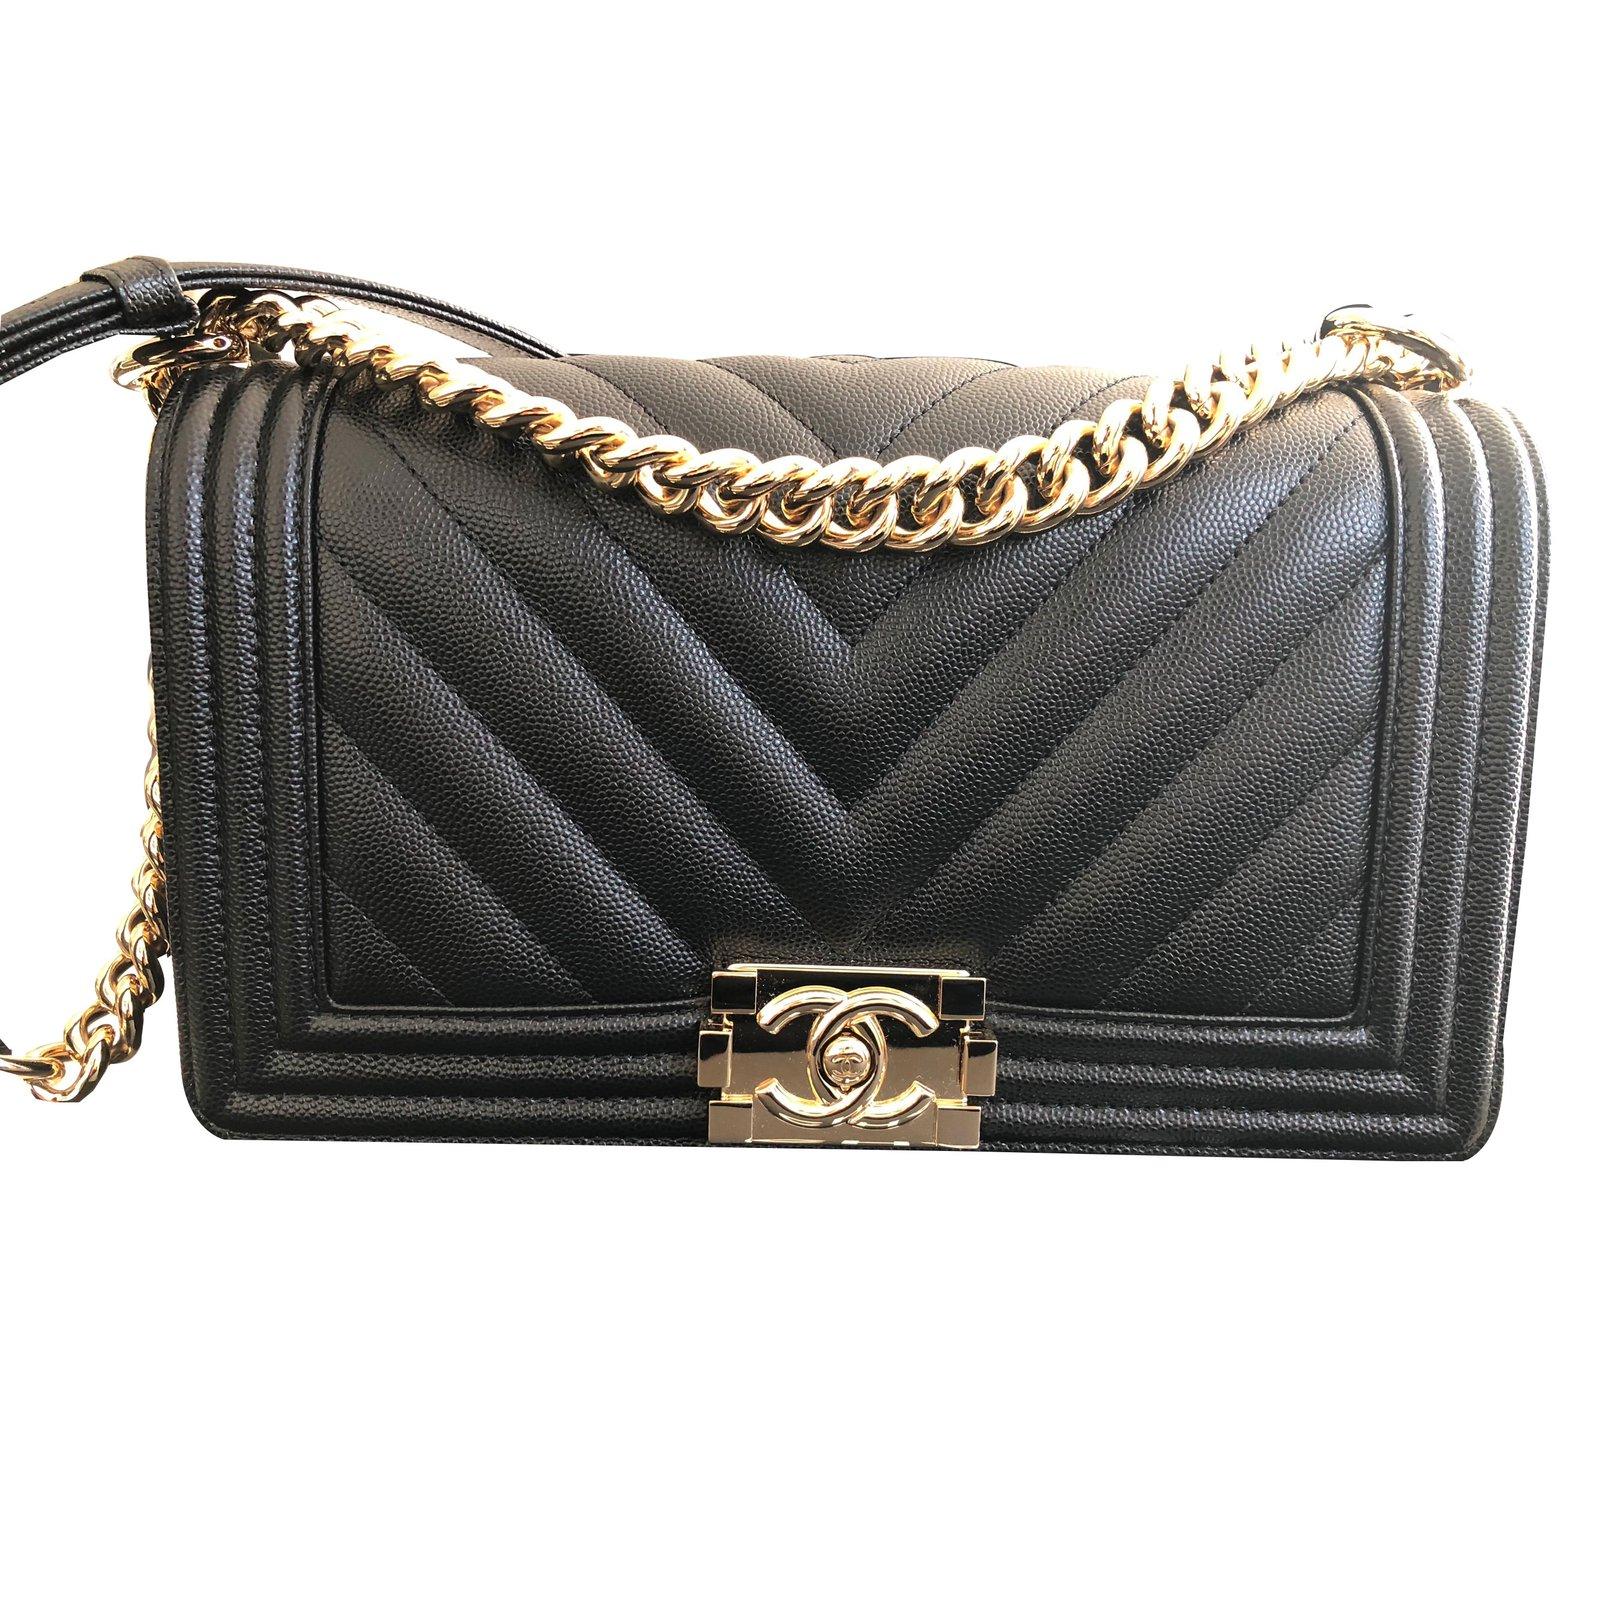 15cc6c90f6b9 Chanel Sac Boy Handbags Pony hair Black ref.85068 - Joli Closet